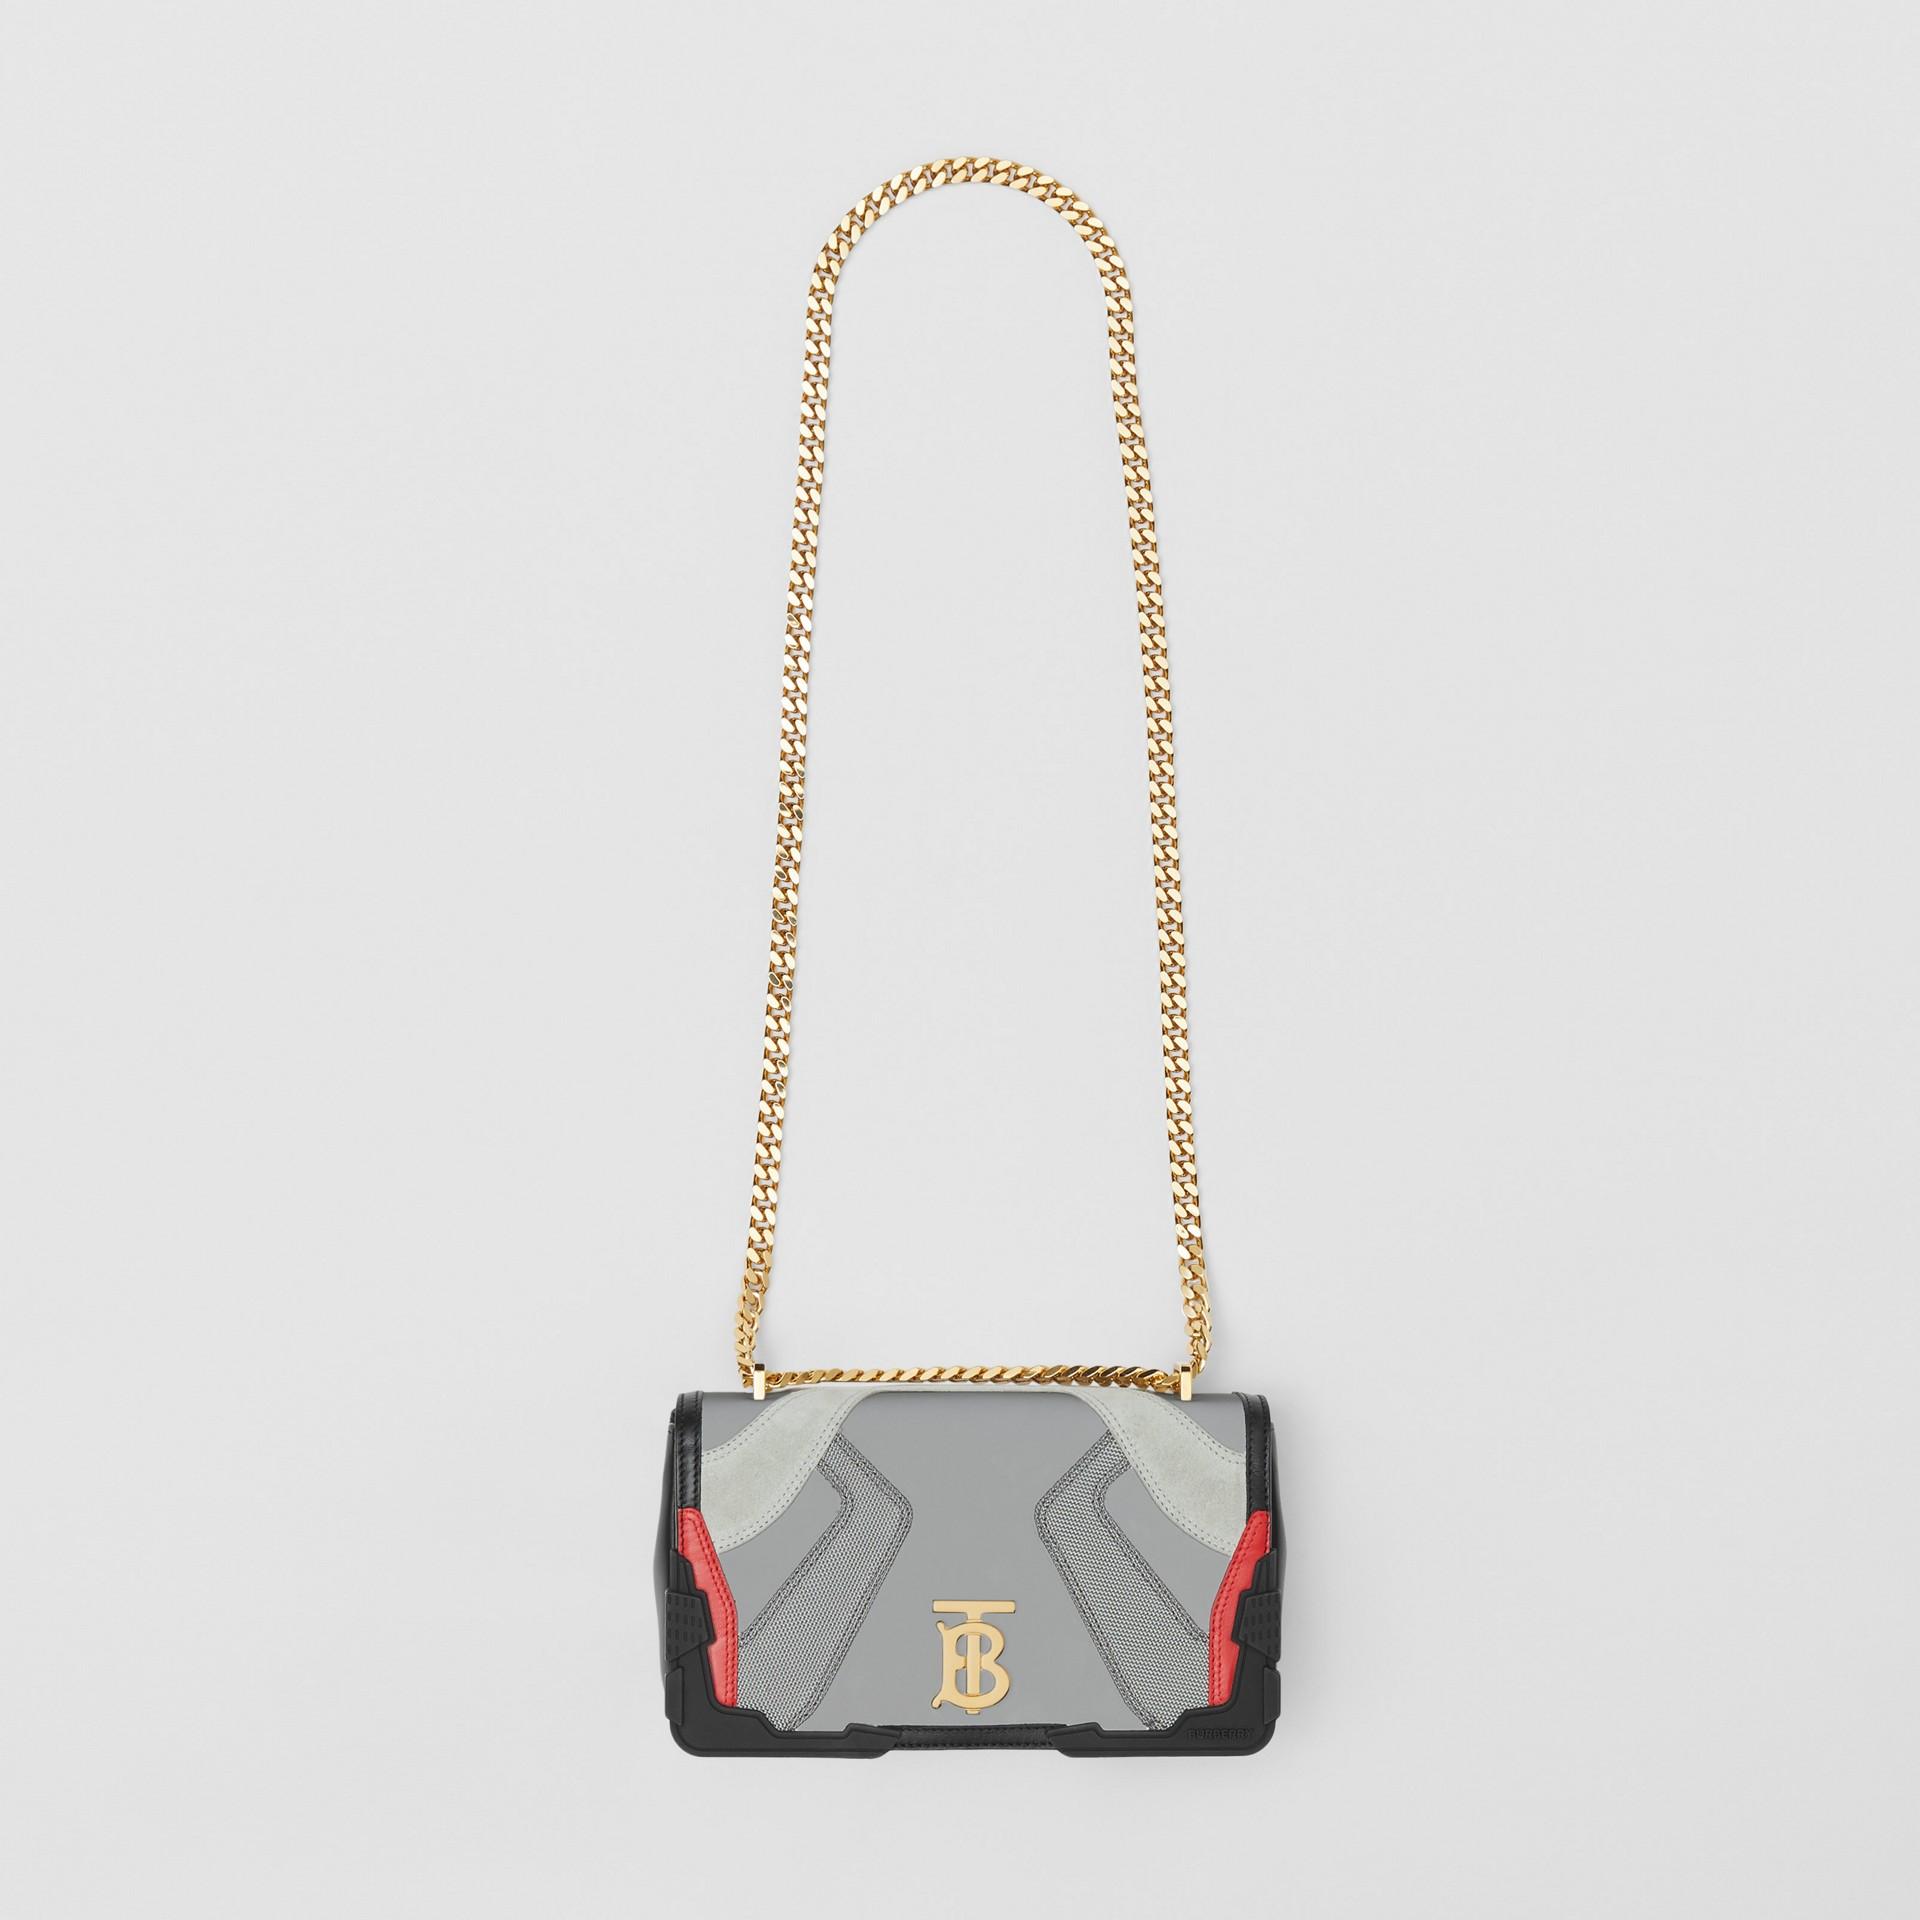 Small Appliqué Leather Lola Bag in Multicolour - Women | Burberry United Kingdom - gallery image 2